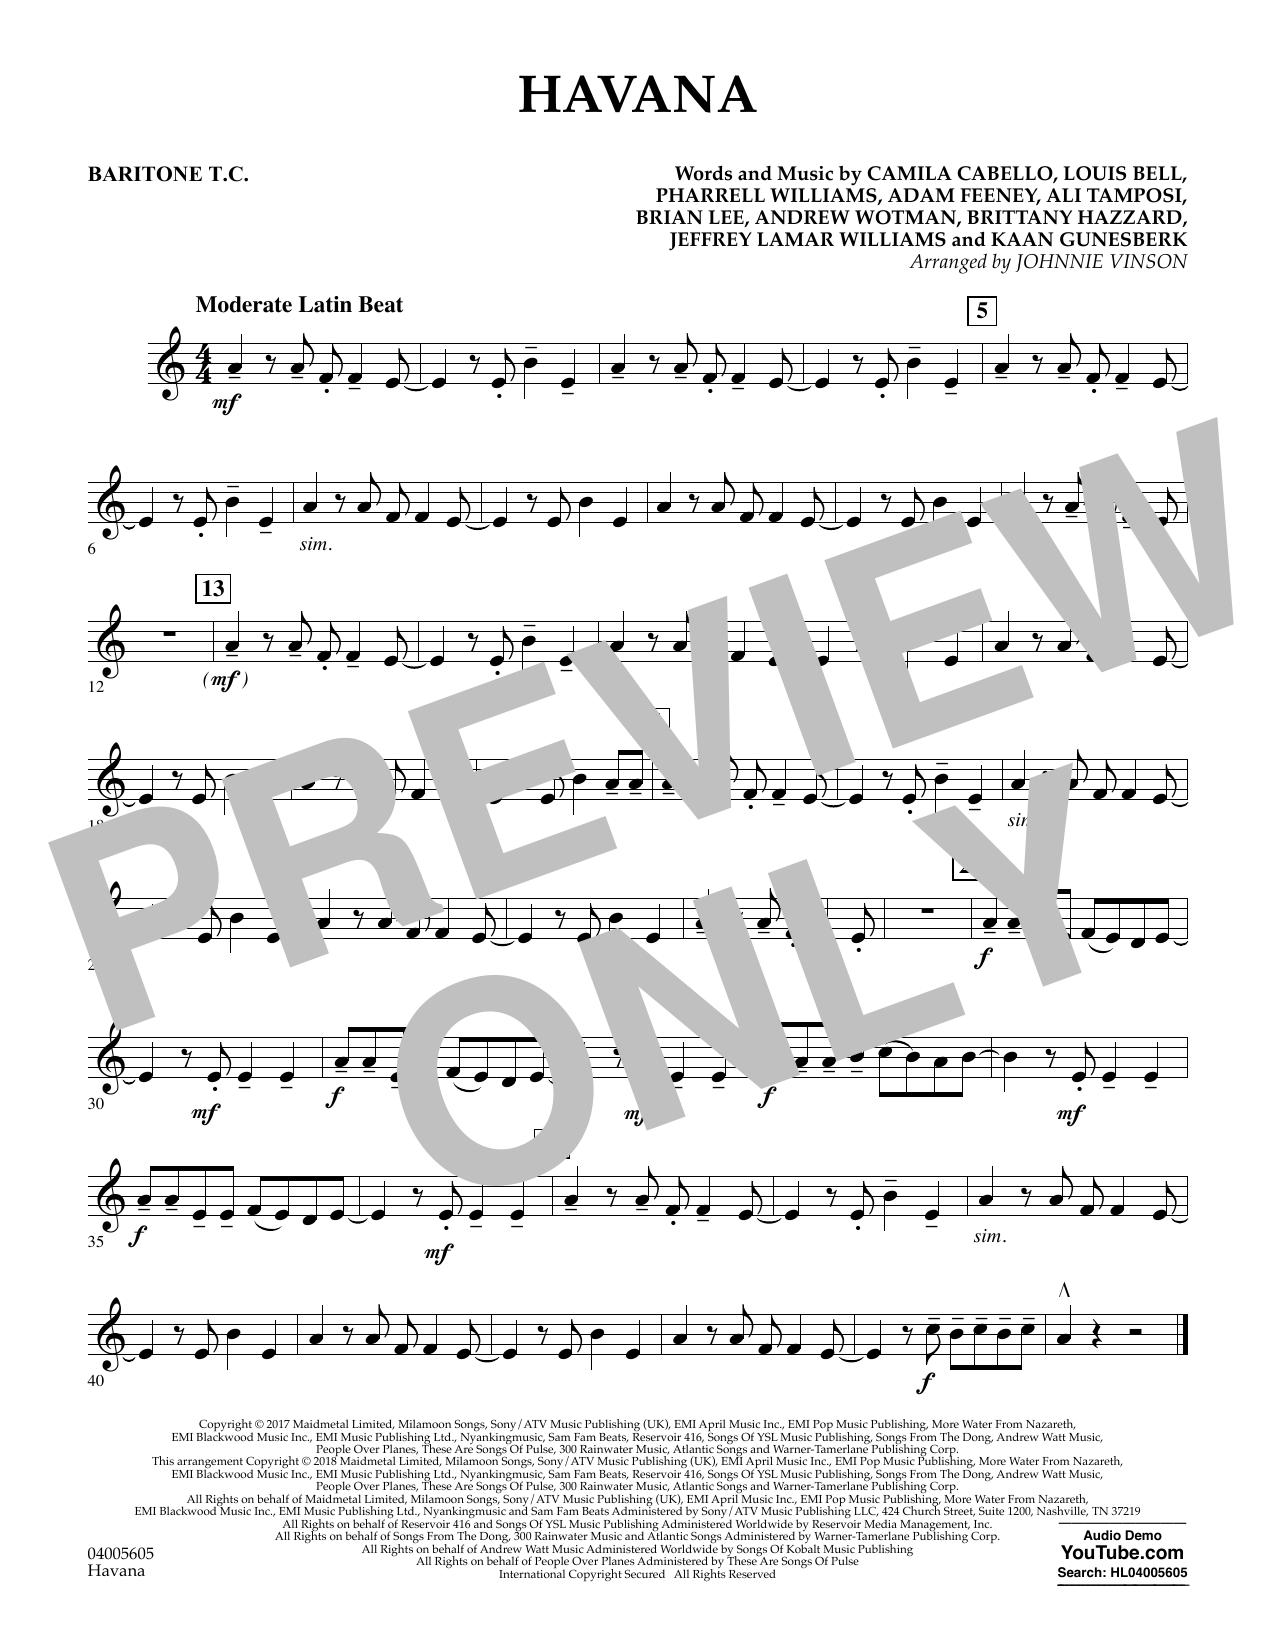 Johnnie Vinson Havana - Baritone T.C. sheet music notes and chords. Download Printable PDF.